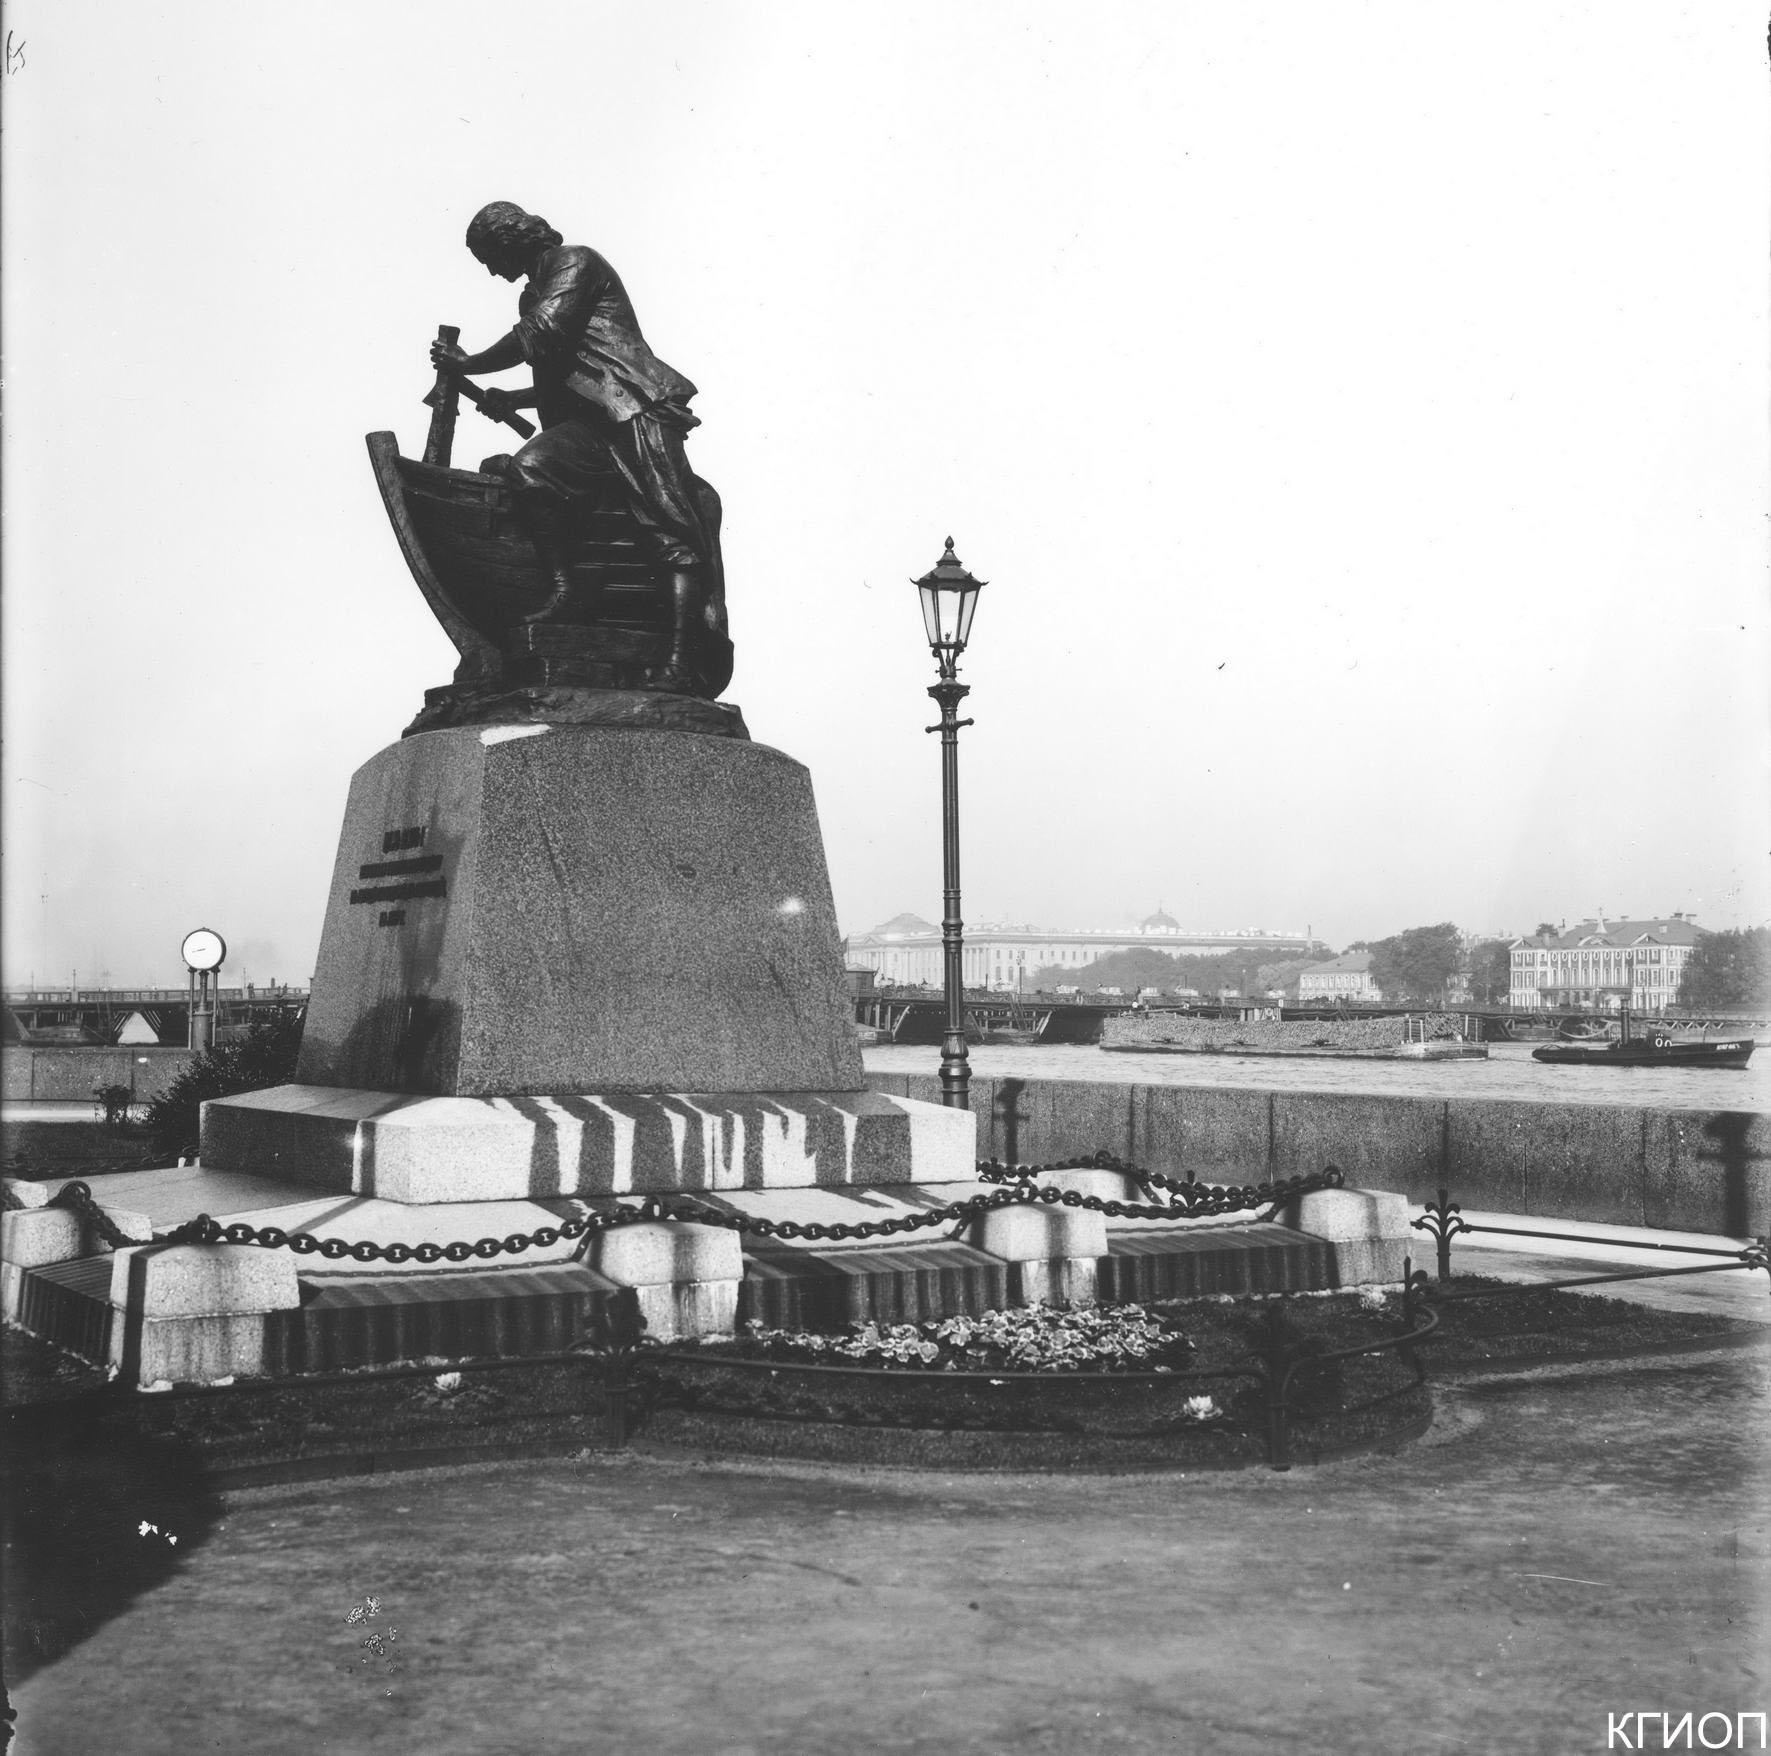 15. Памятник Петру I «Царь-плотник». Адмиралтейская наб. 1915